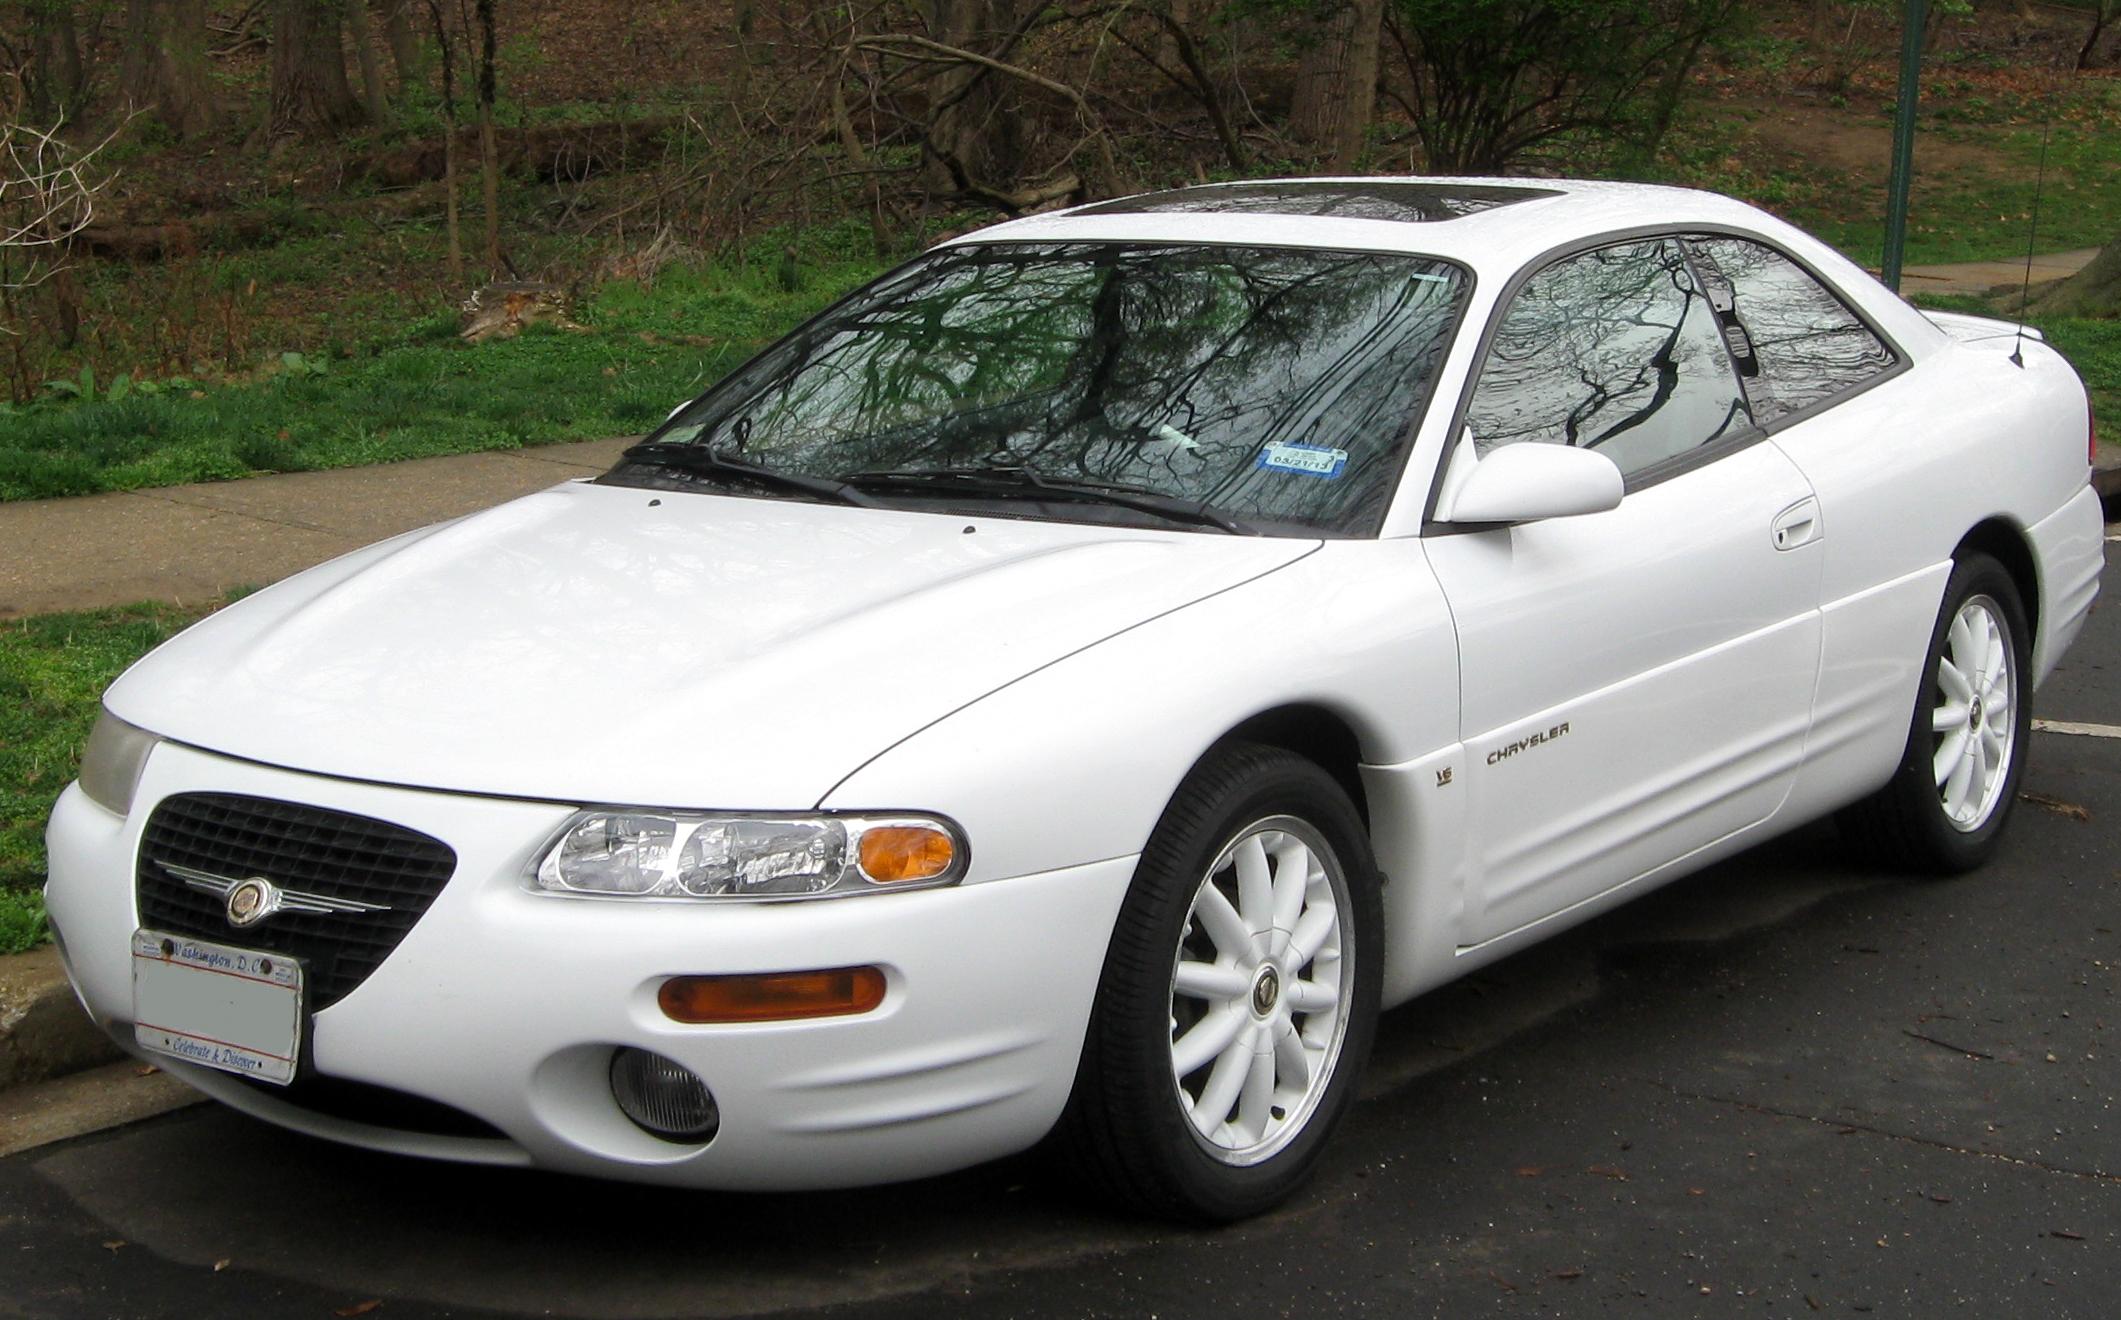 2000 Chrysler Sebring LXI Coupe